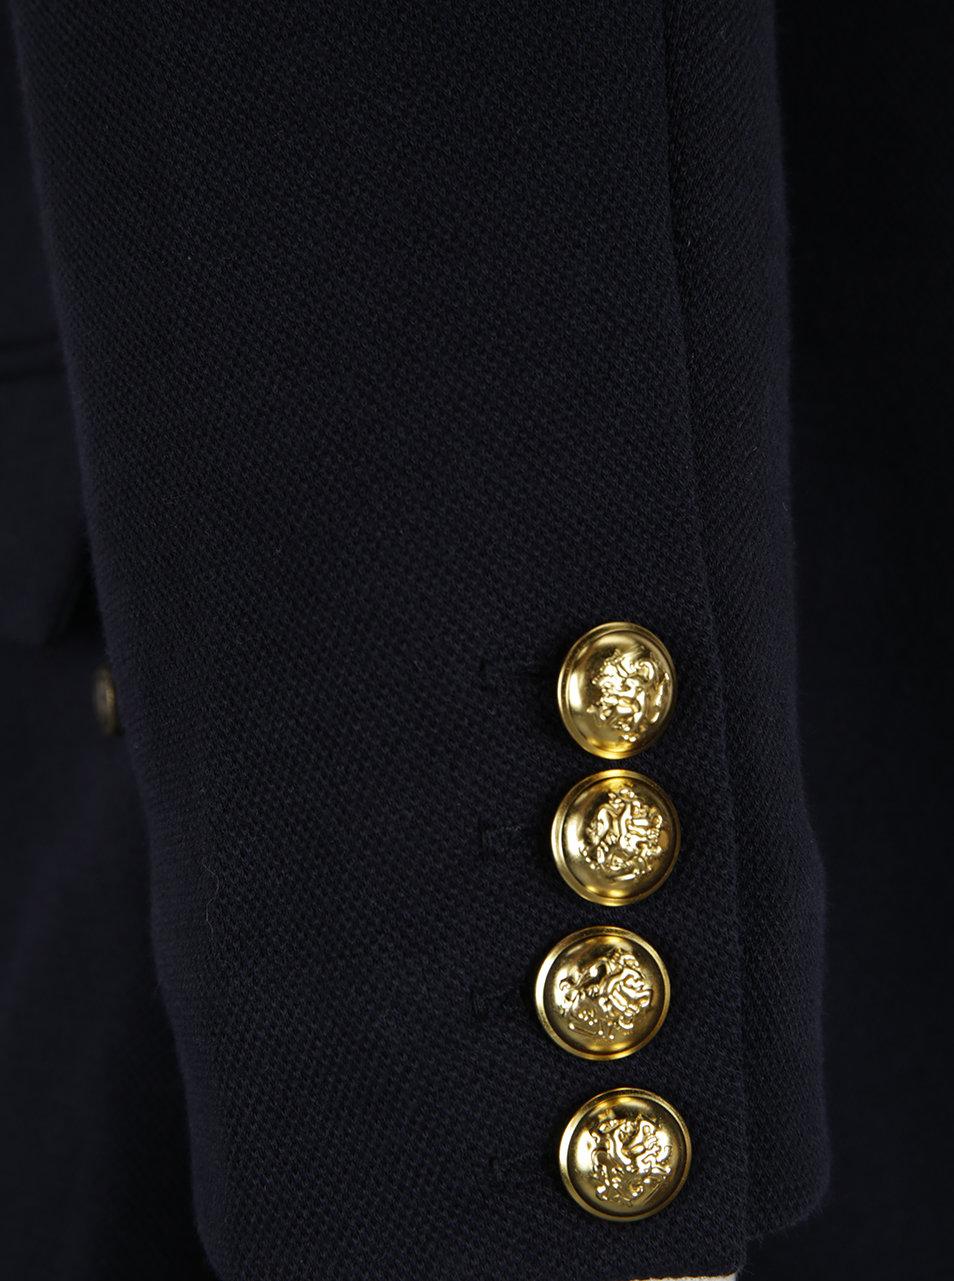 Modré dámske sako s gombíkom v zlatej farbe Garcia Jeans ... c1ebf2d0476